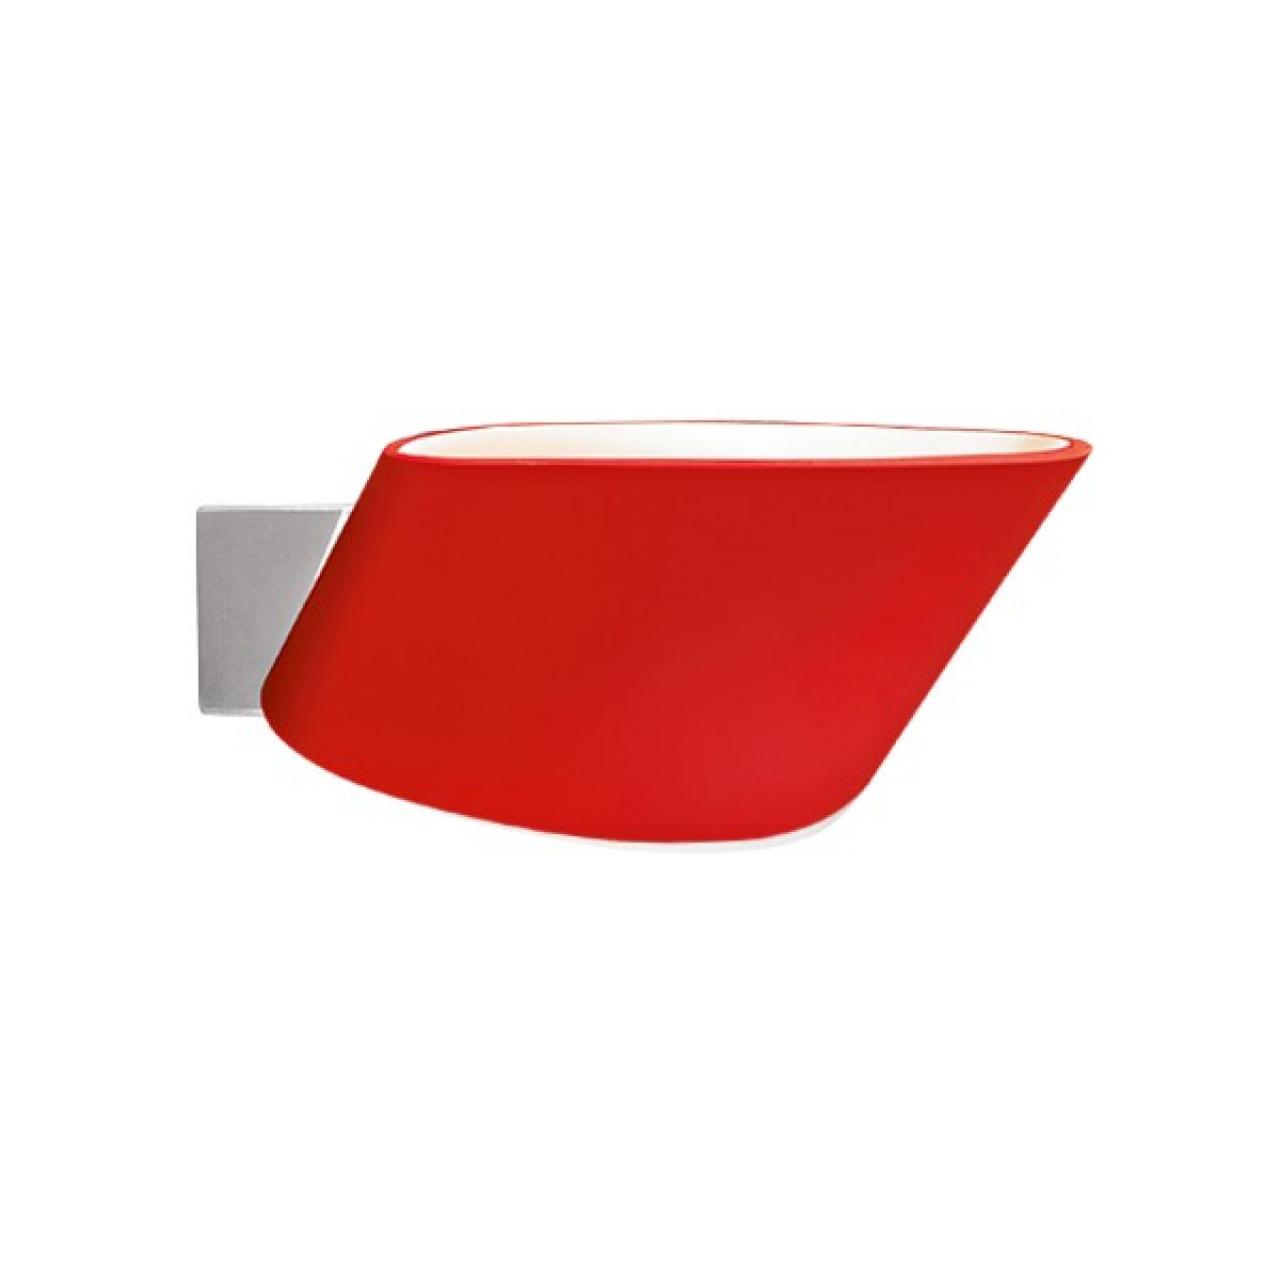 Светильник настенный Muro 1х150W R7s красный Lightstar 808632